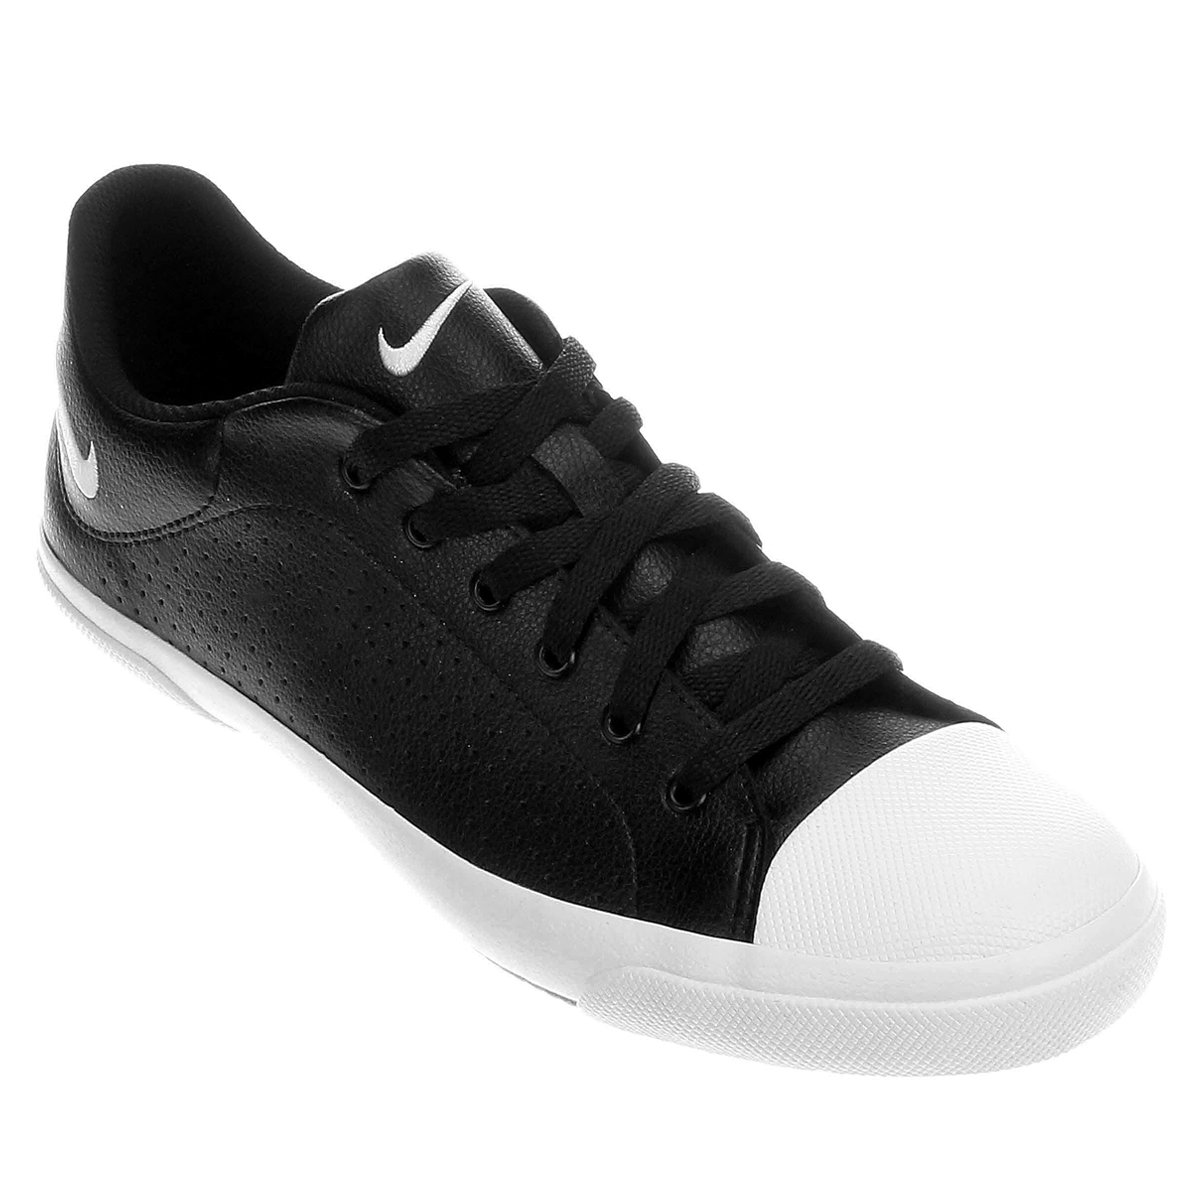 d659f368ebb Tênis Nike Biscuit 2 Sl - Compre Agora